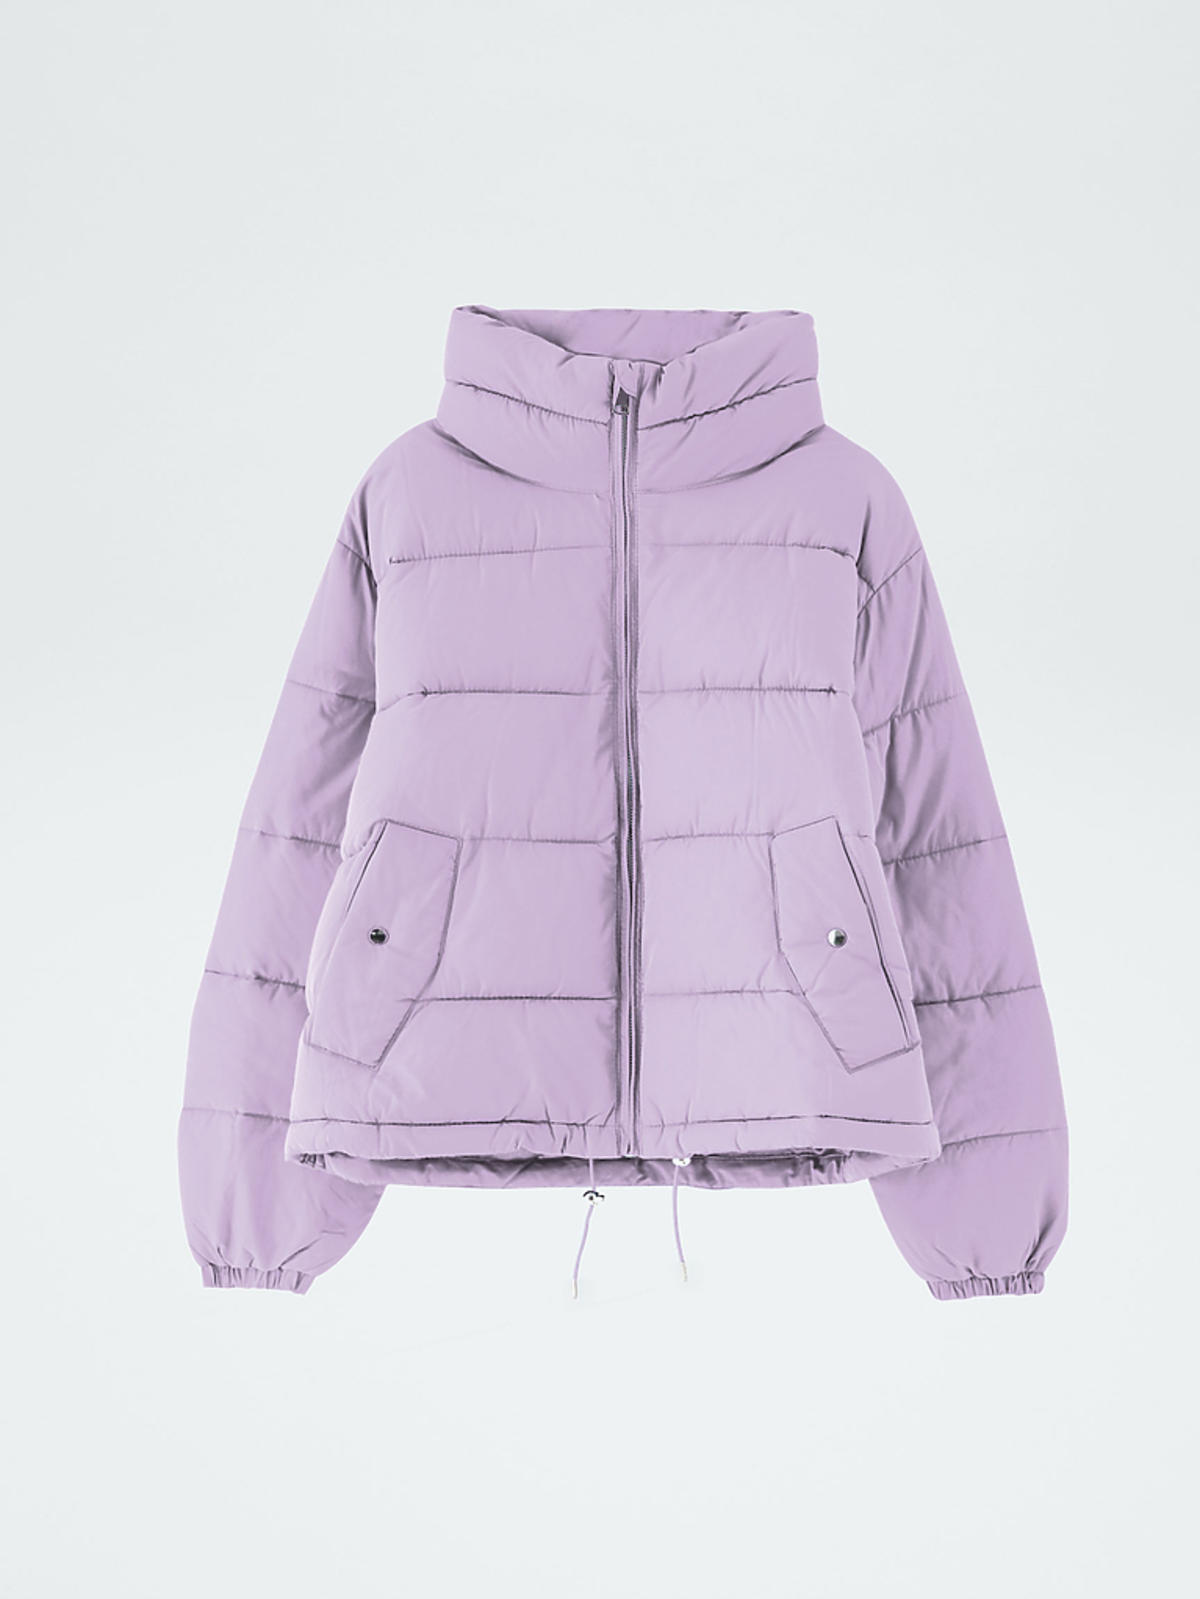 fioletowa kurtka puchowa z Pull&Bear